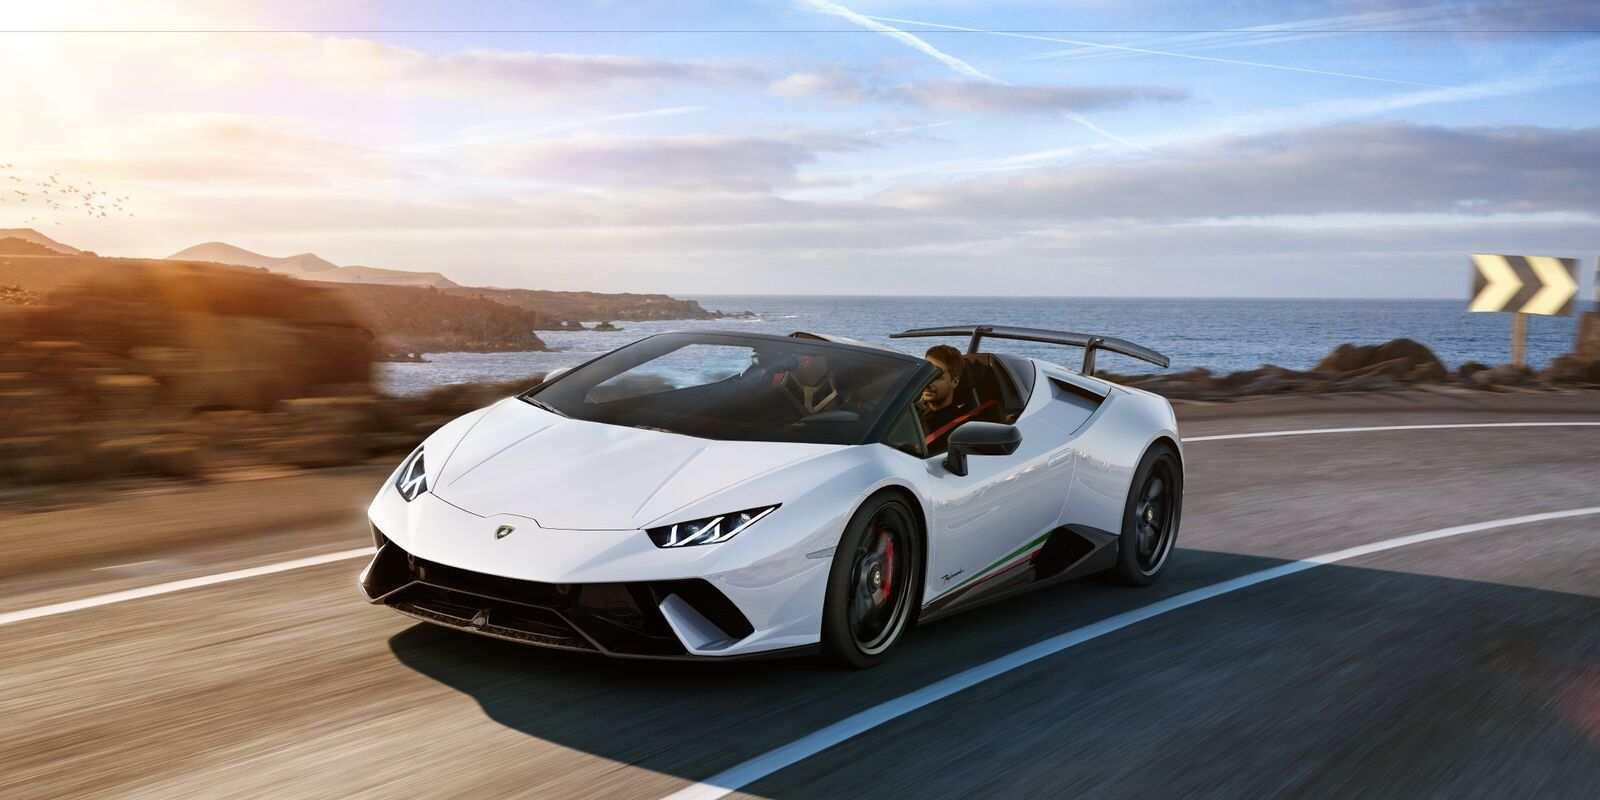 31 All New 2019 Lamborghini Spyder Ratings by 2019 Lamborghini Spyder